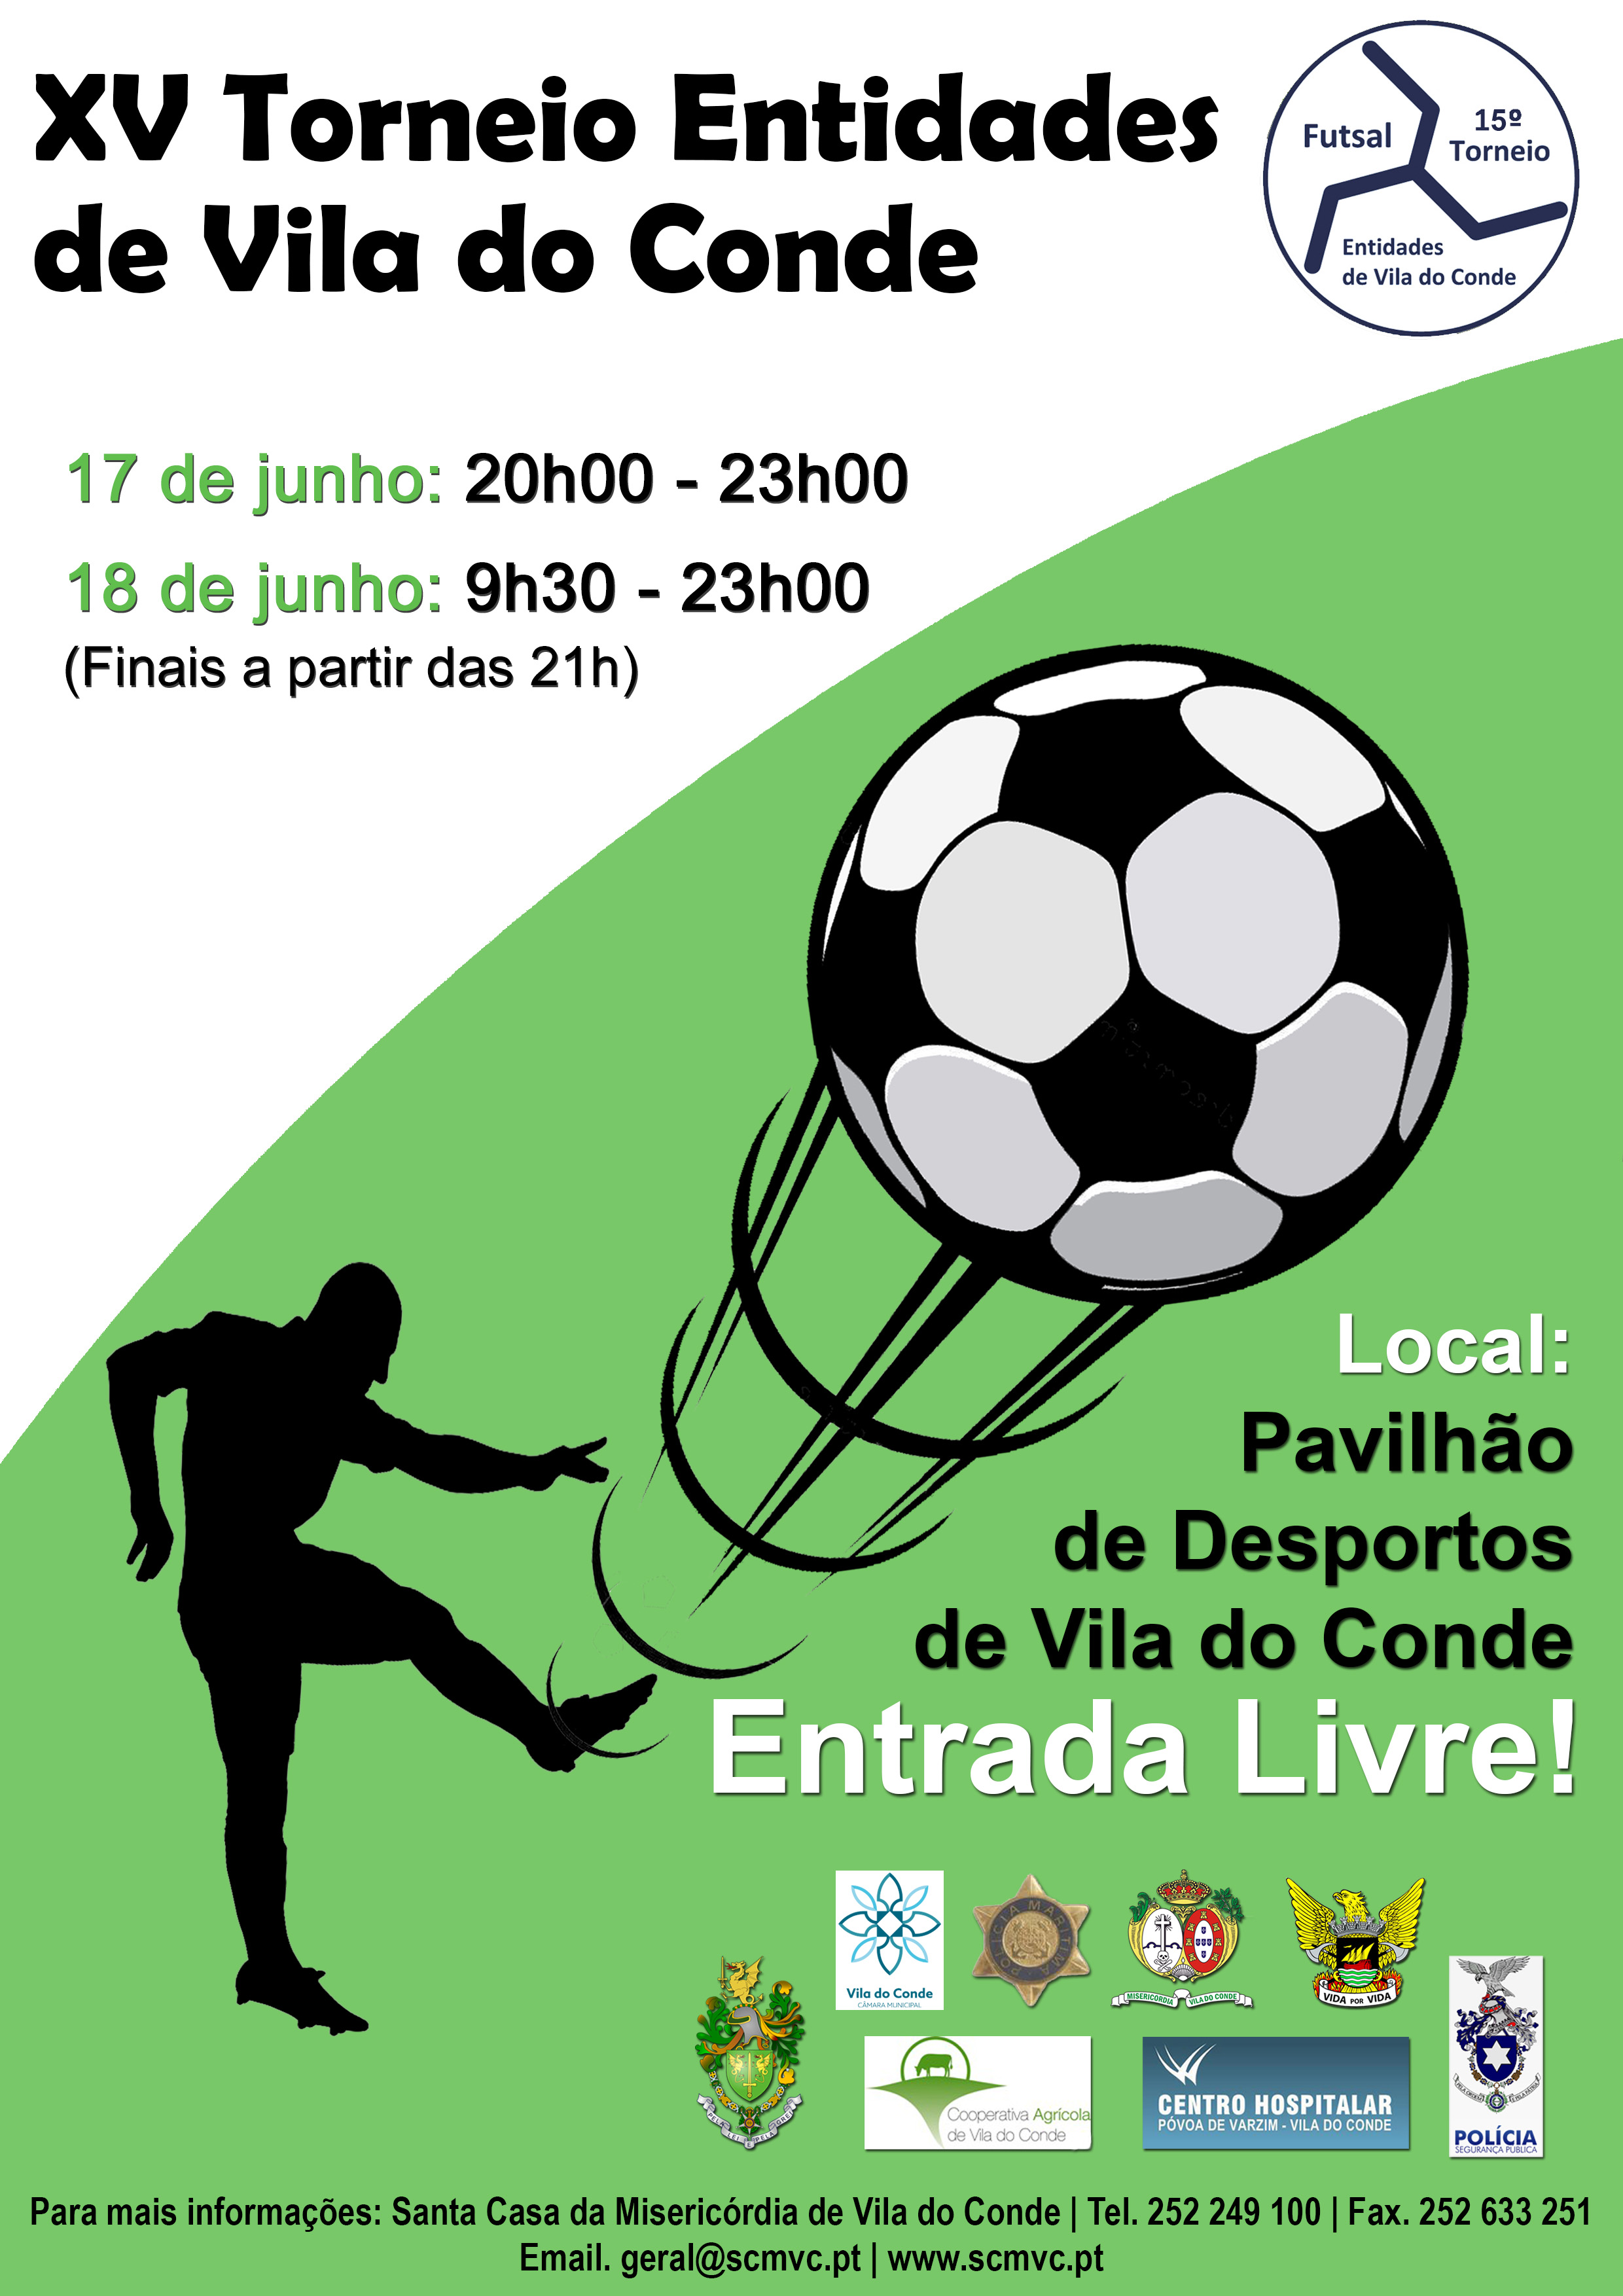 15º Torneio Futsal Entidades Vila do Conde